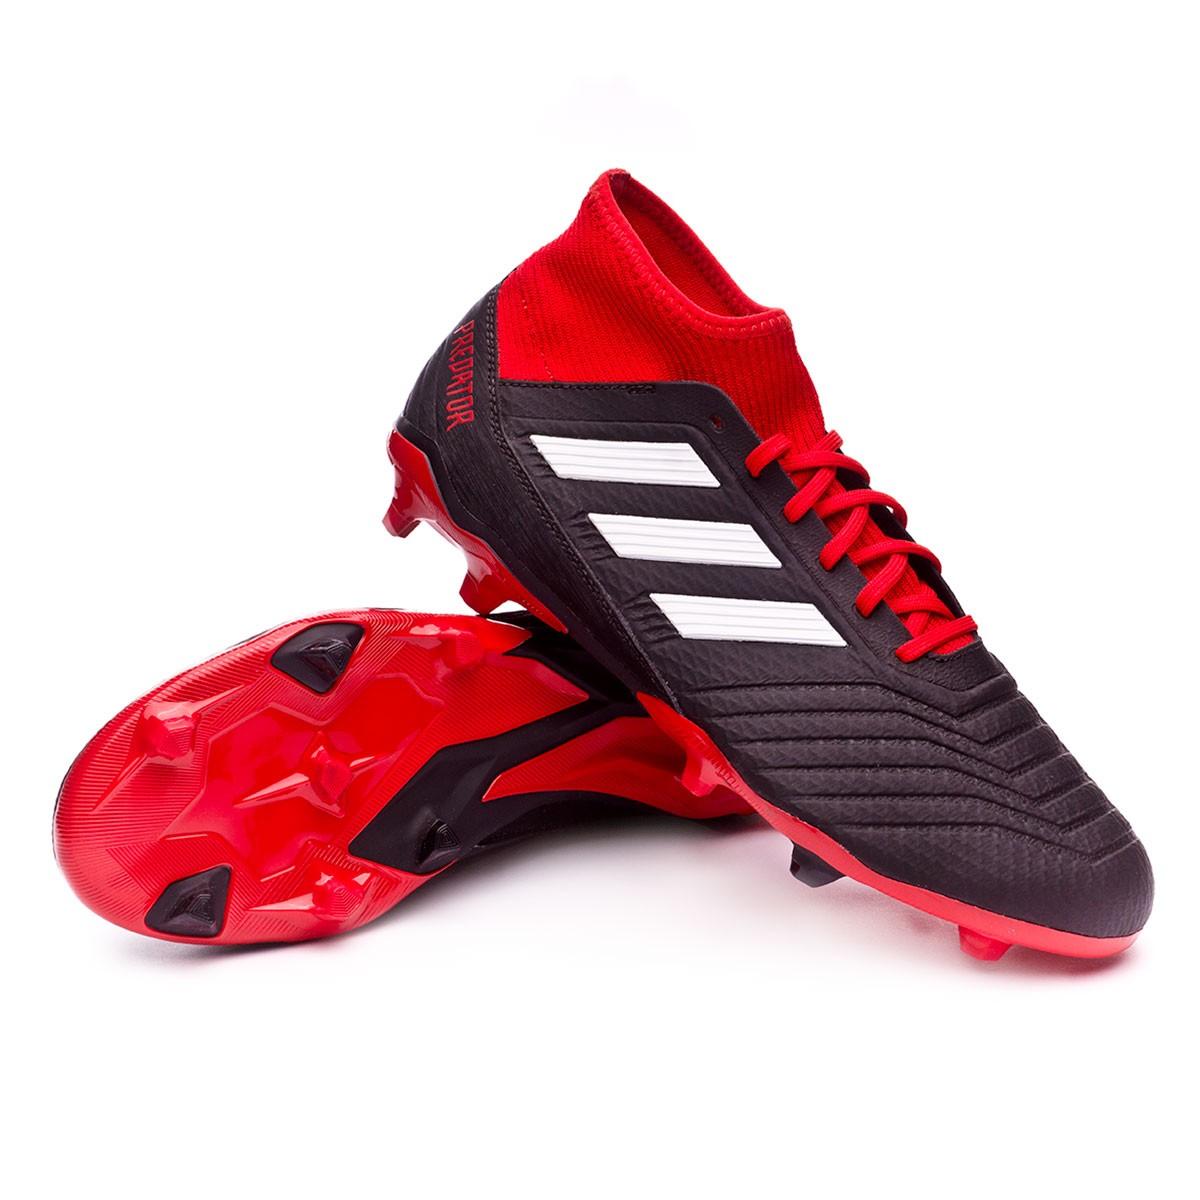 Chaussure de foot adidas Predator 18.3 FG Core black-White-Red ...